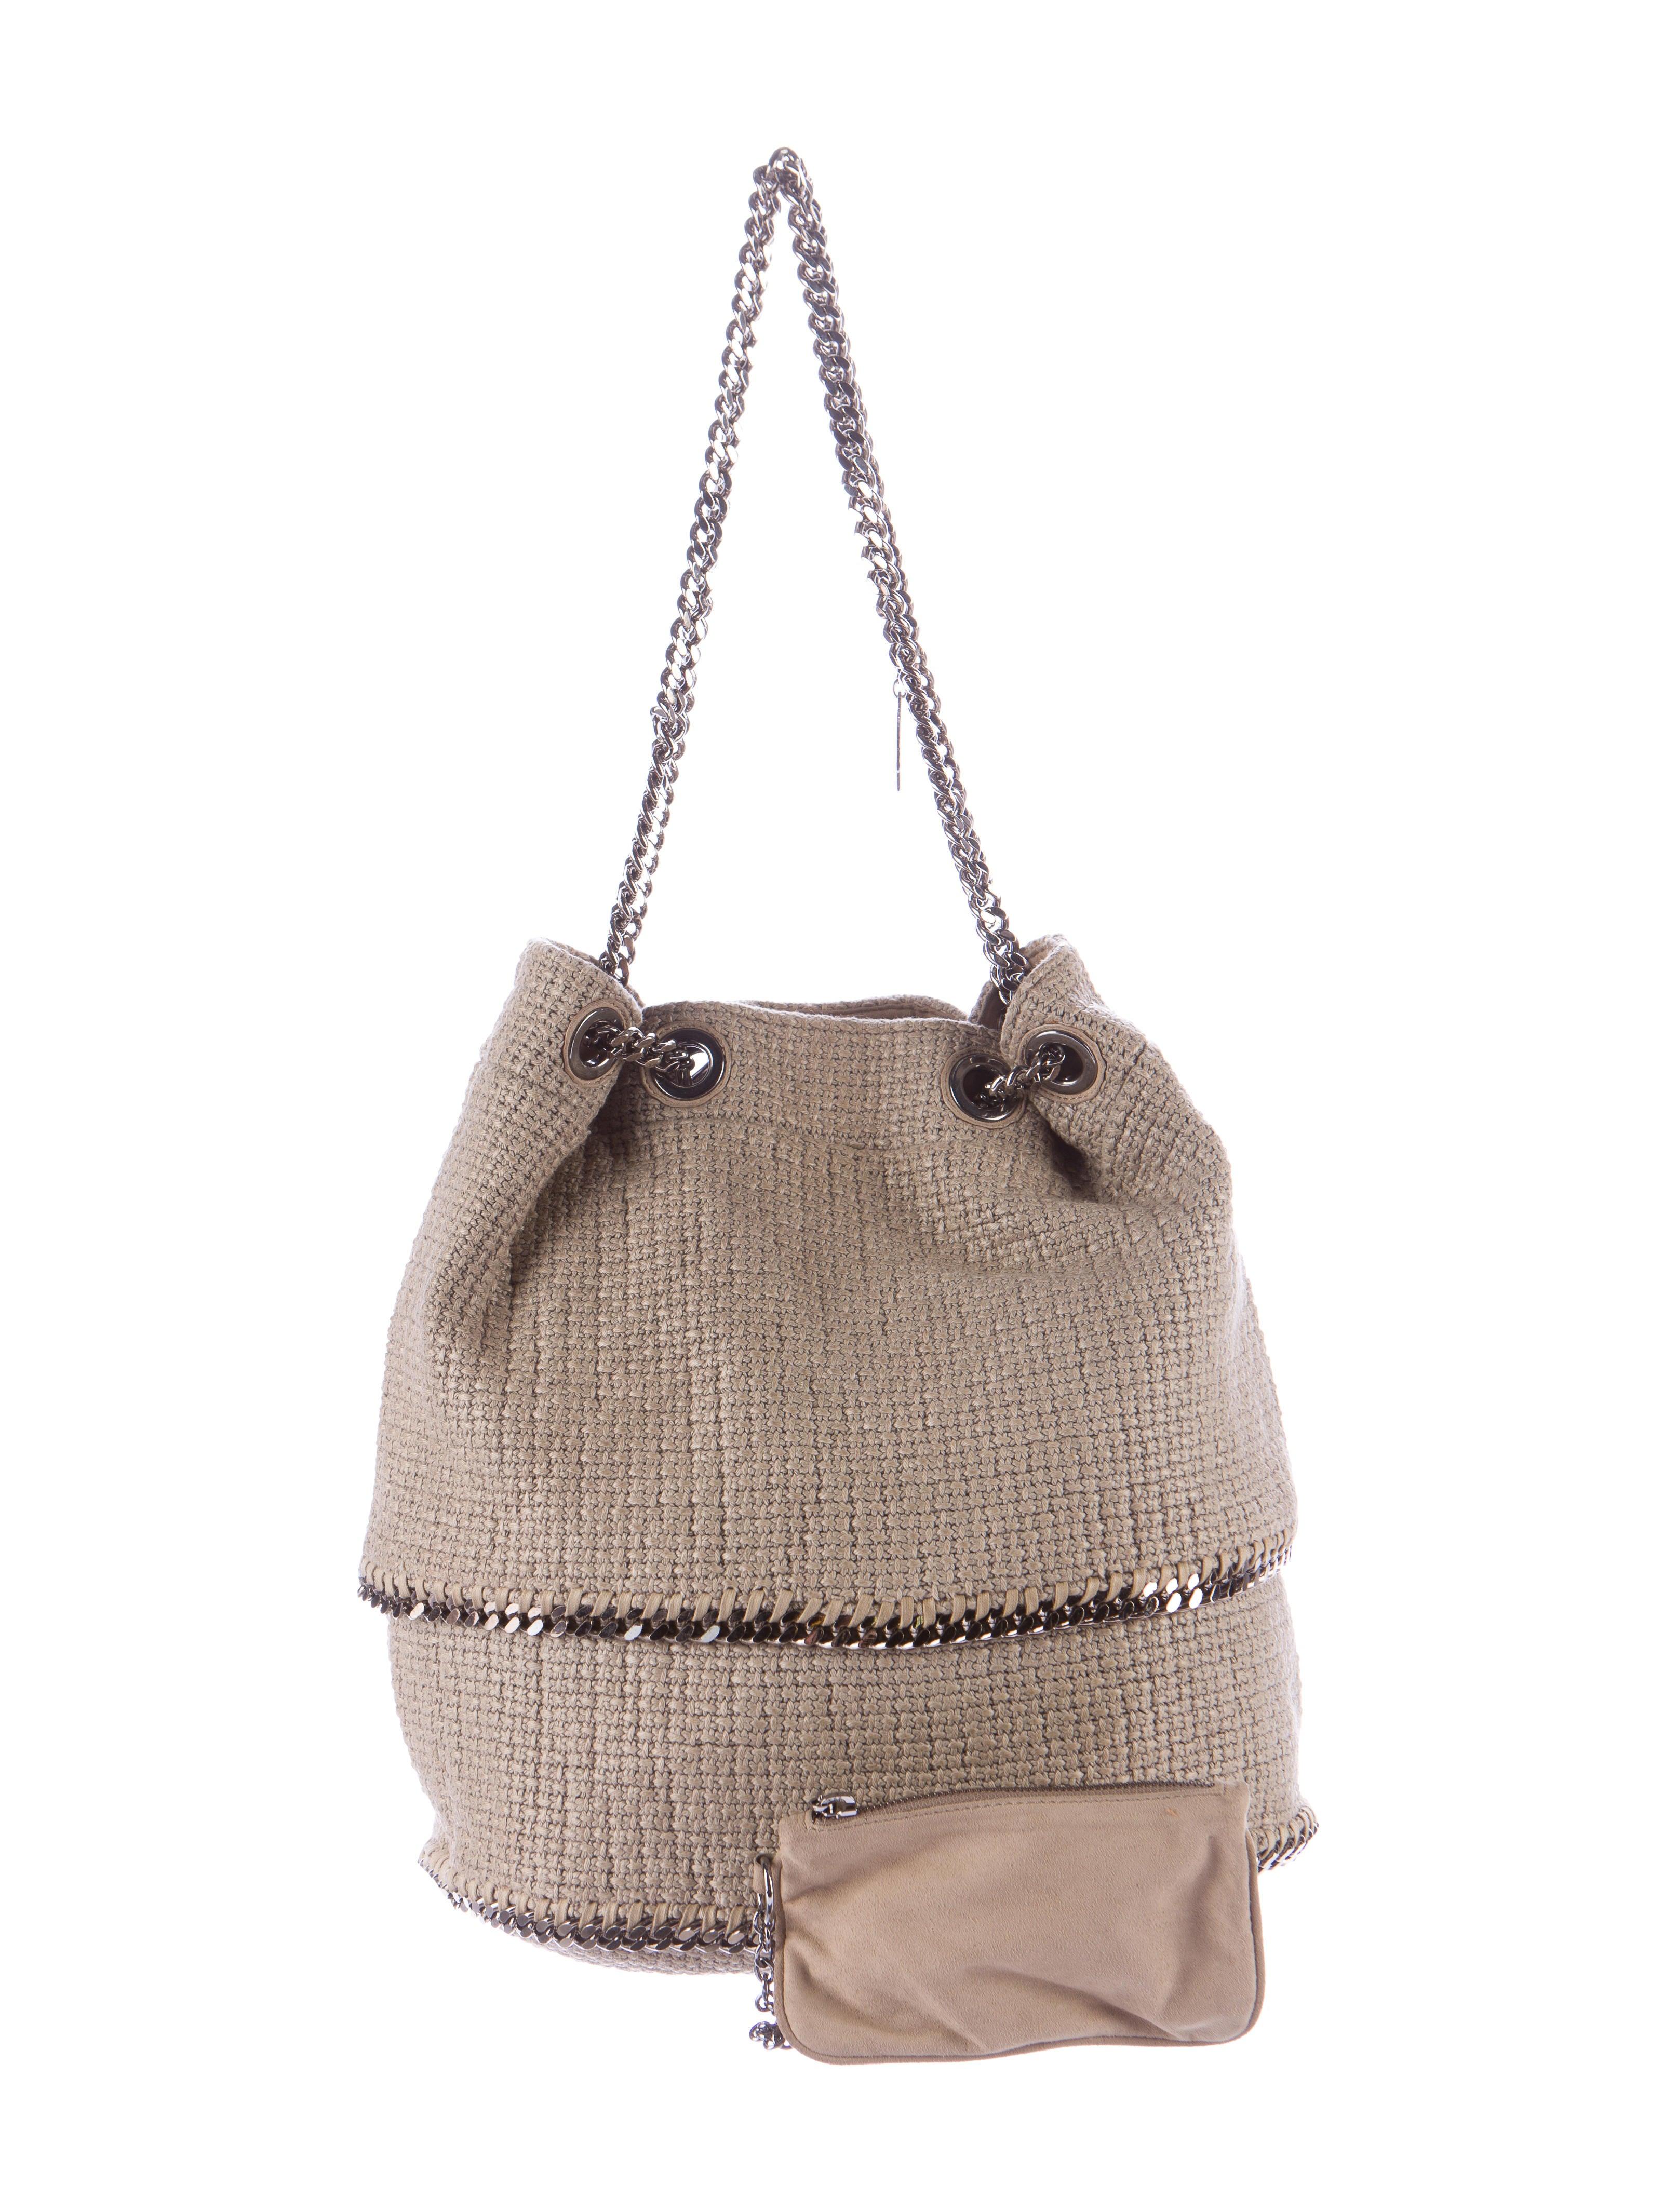 stella mccartney woven falabella shoulder bag handbags stl50203 the realreal. Black Bedroom Furniture Sets. Home Design Ideas